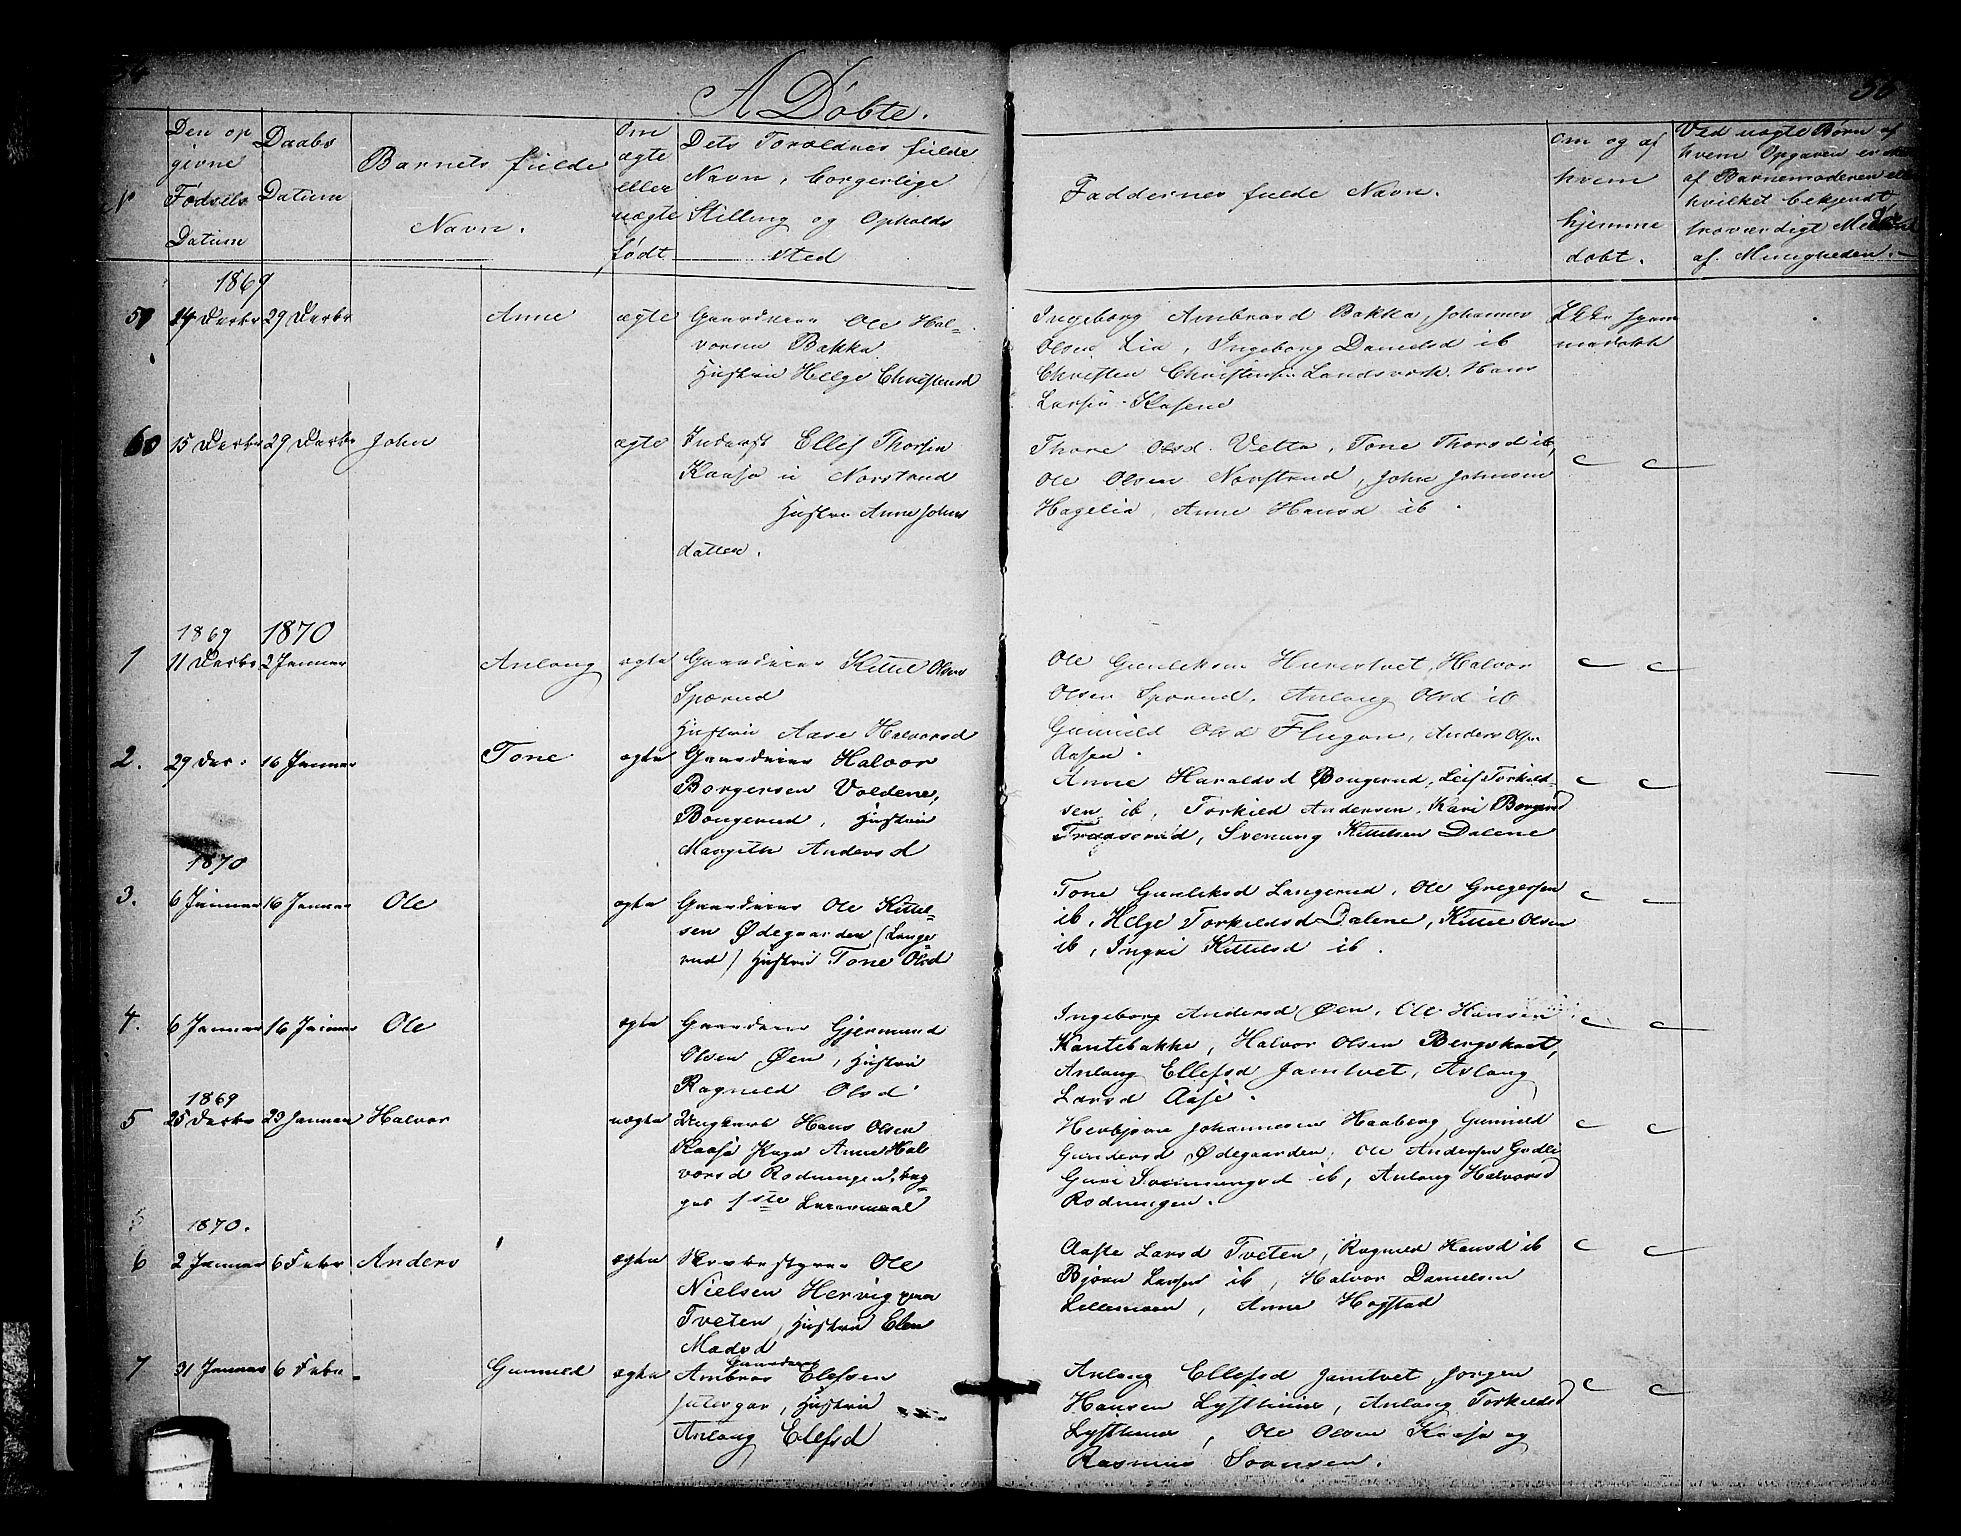 SAKO, Heddal kirkebøker, G/Ga/L0001: Klokkerbok nr. I 1, 1866-1878, s. 54-55